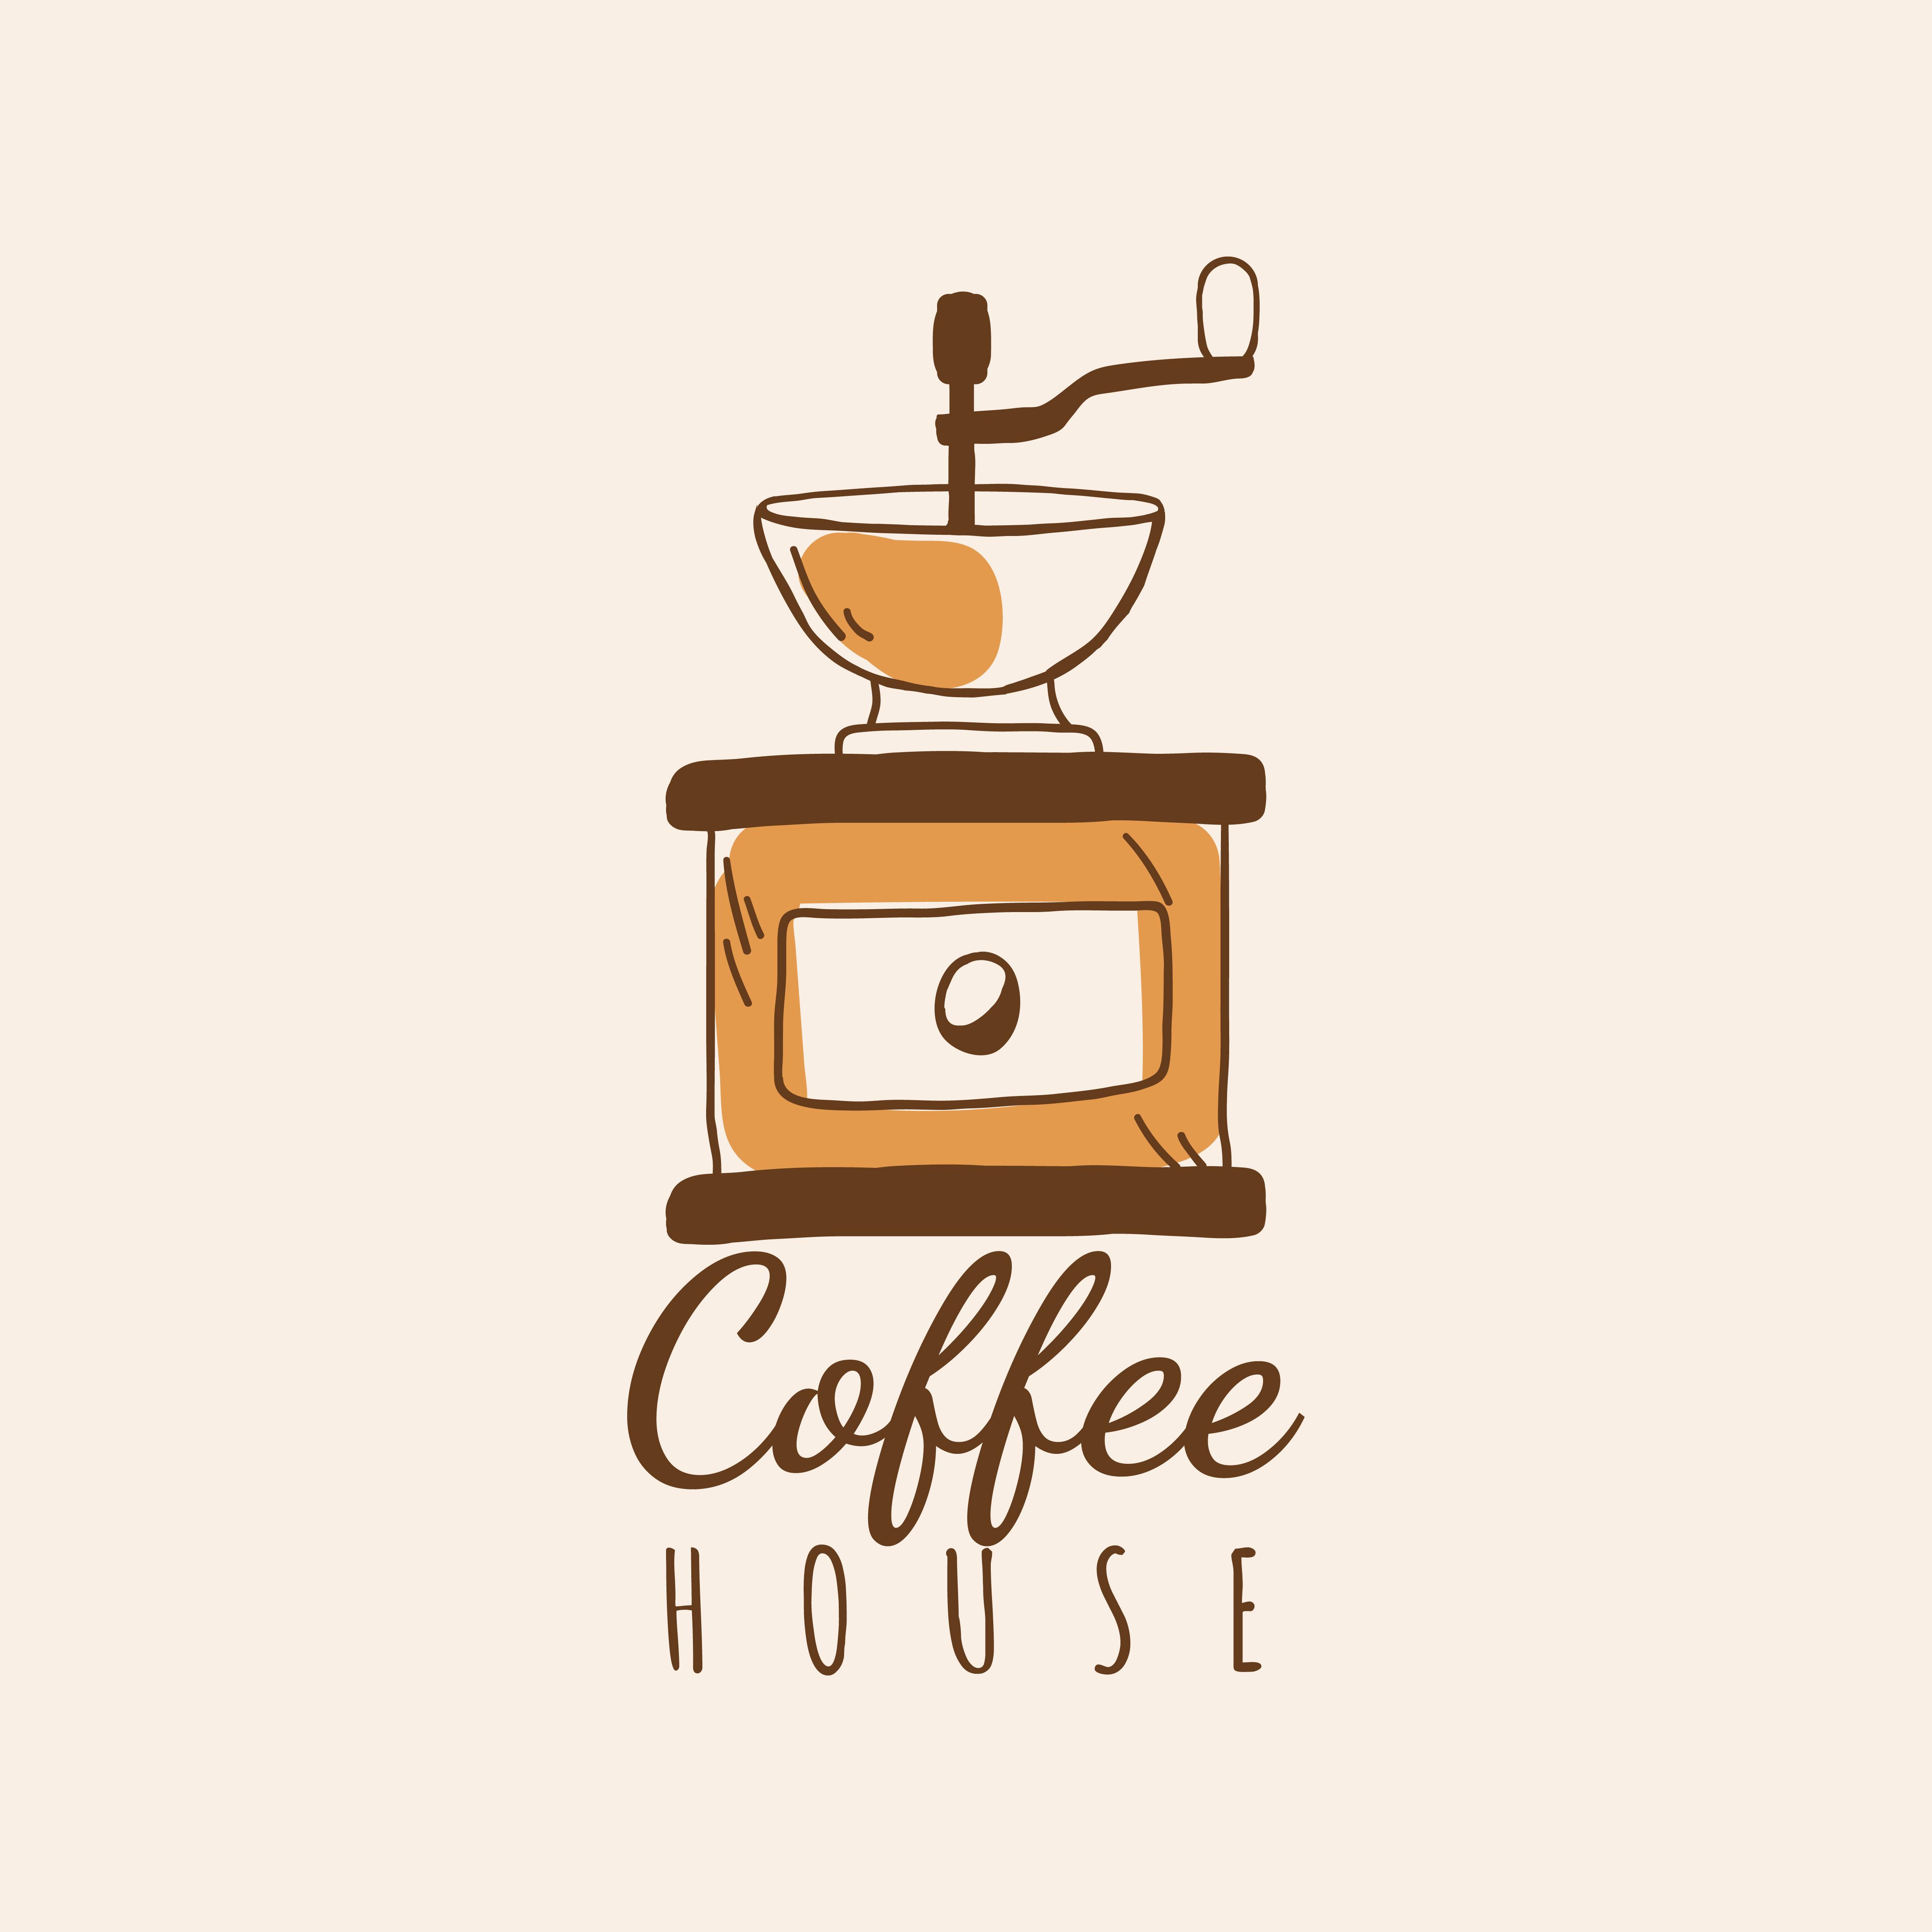 Картинки эмблем кафе